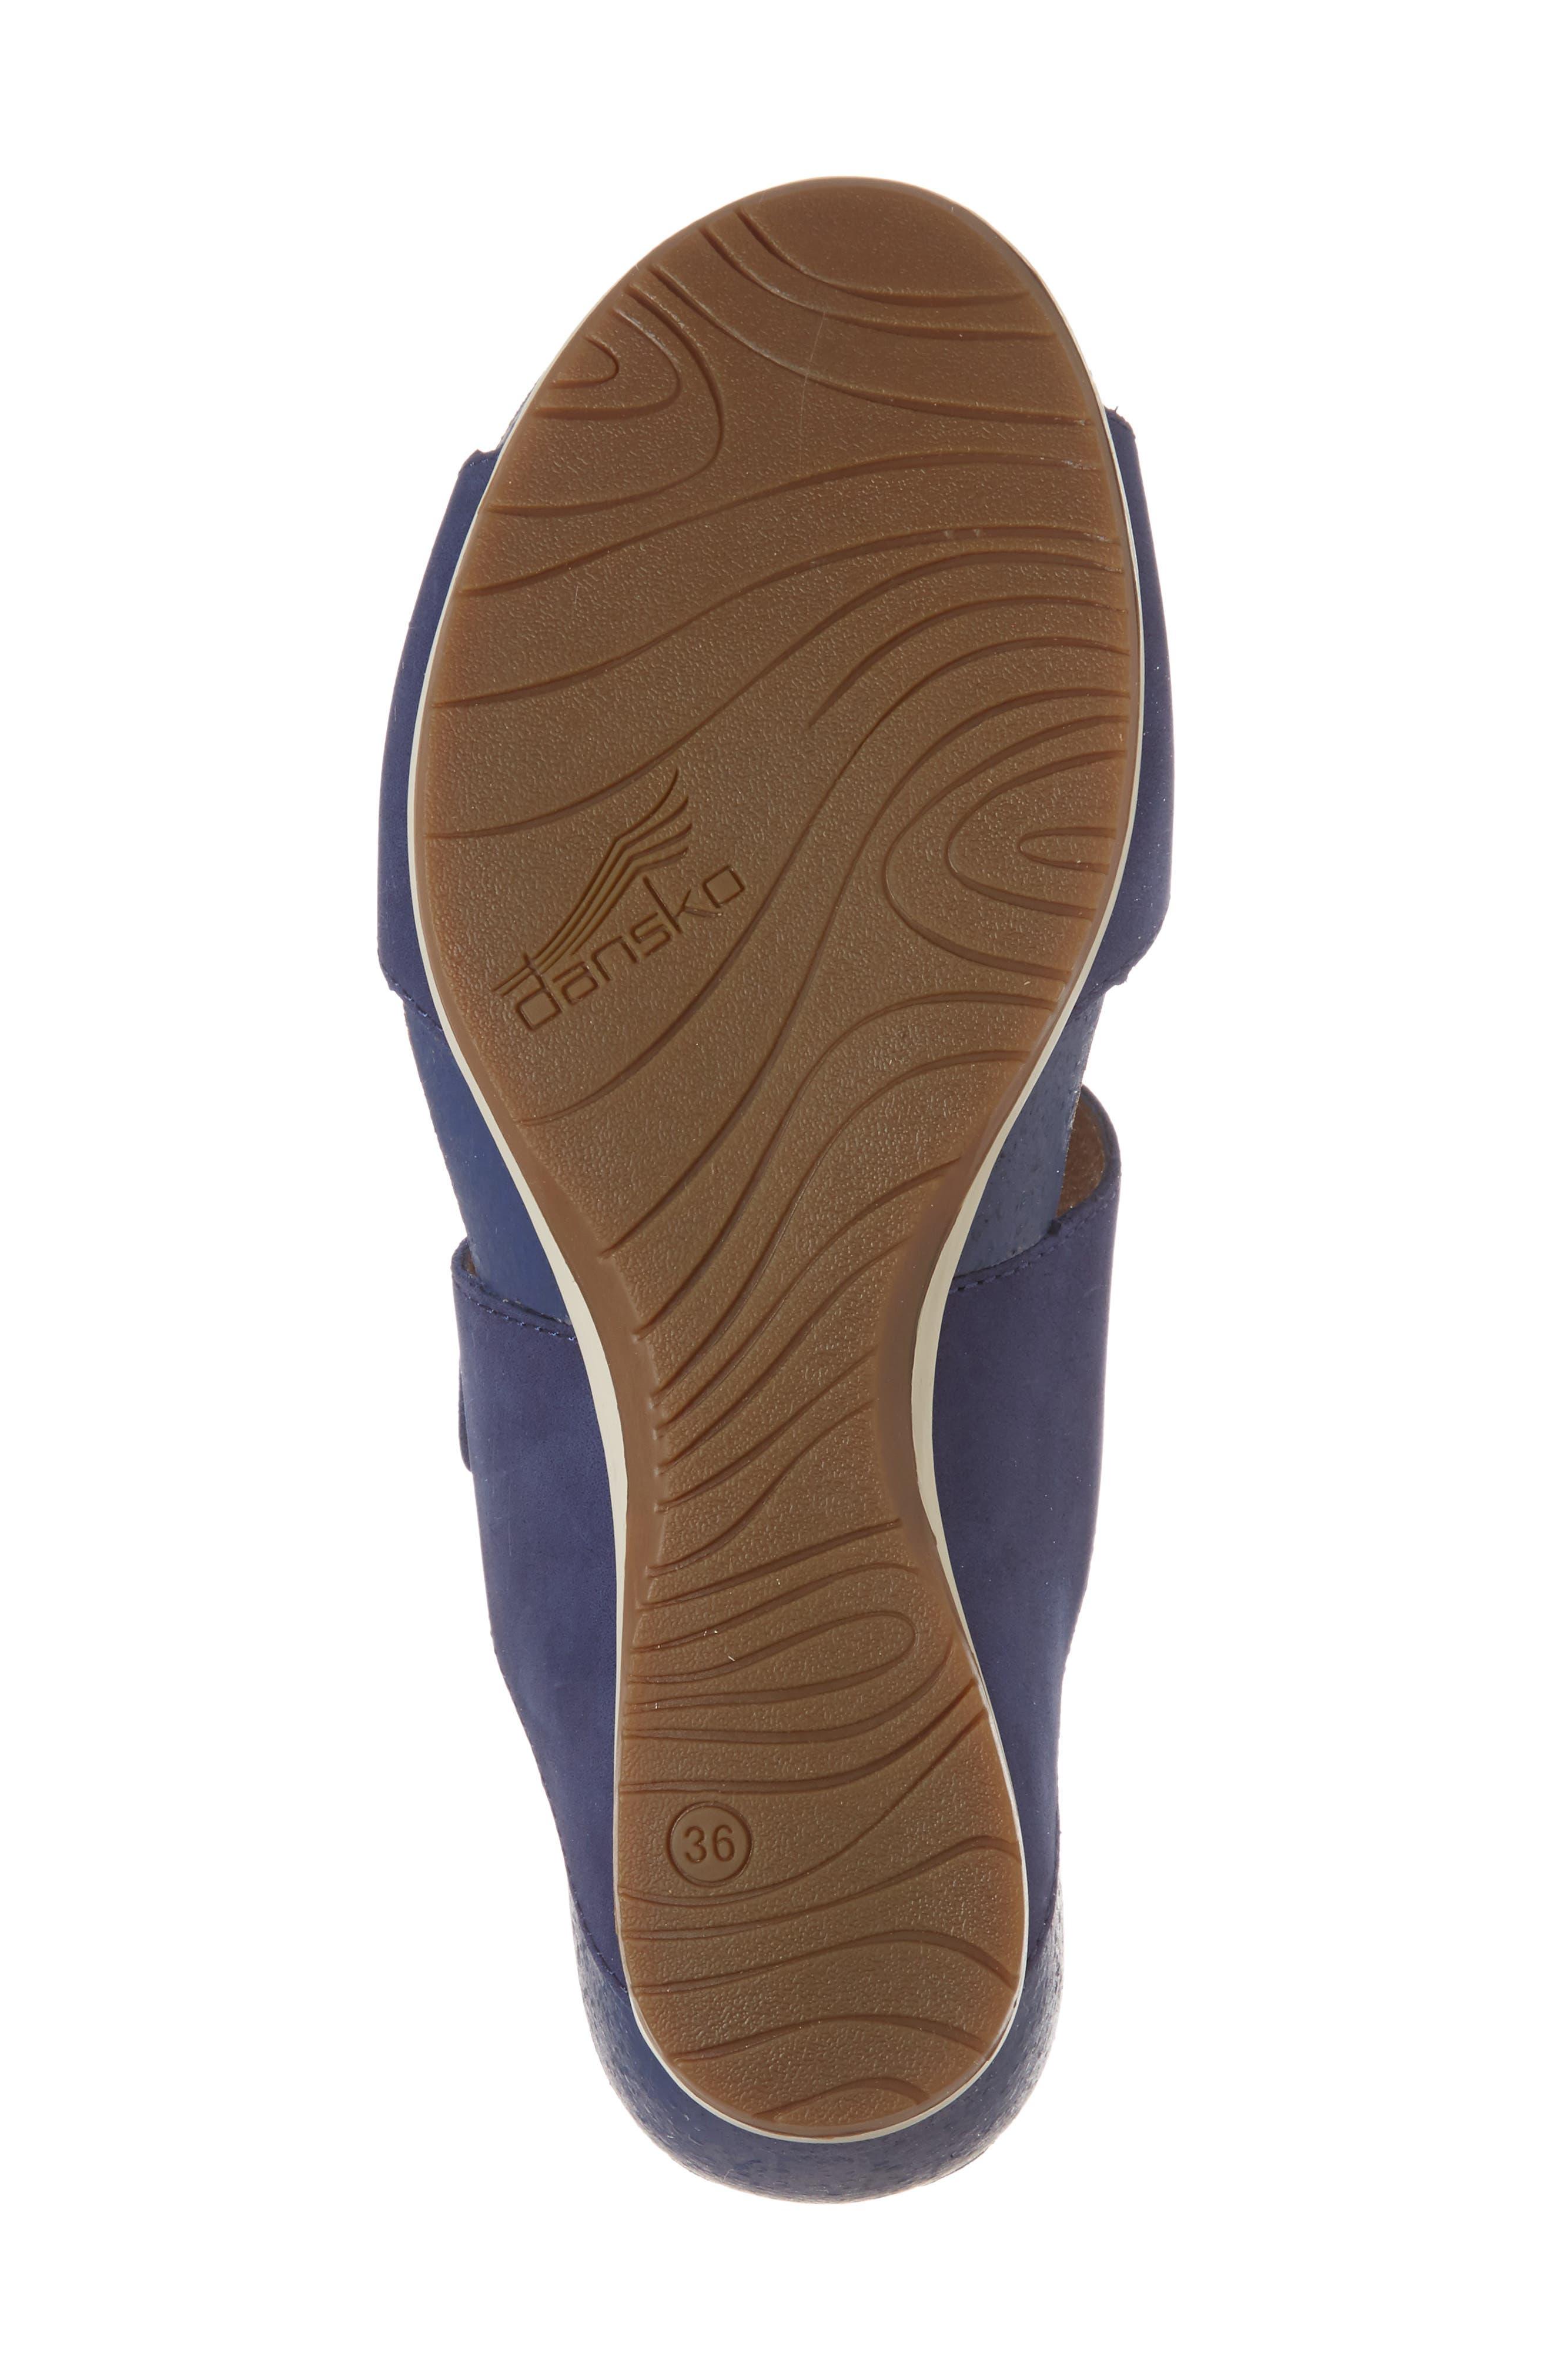 Vienna Slide Sandal,                             Alternate thumbnail 6, color,                             Blue Milled Nubuck Leather